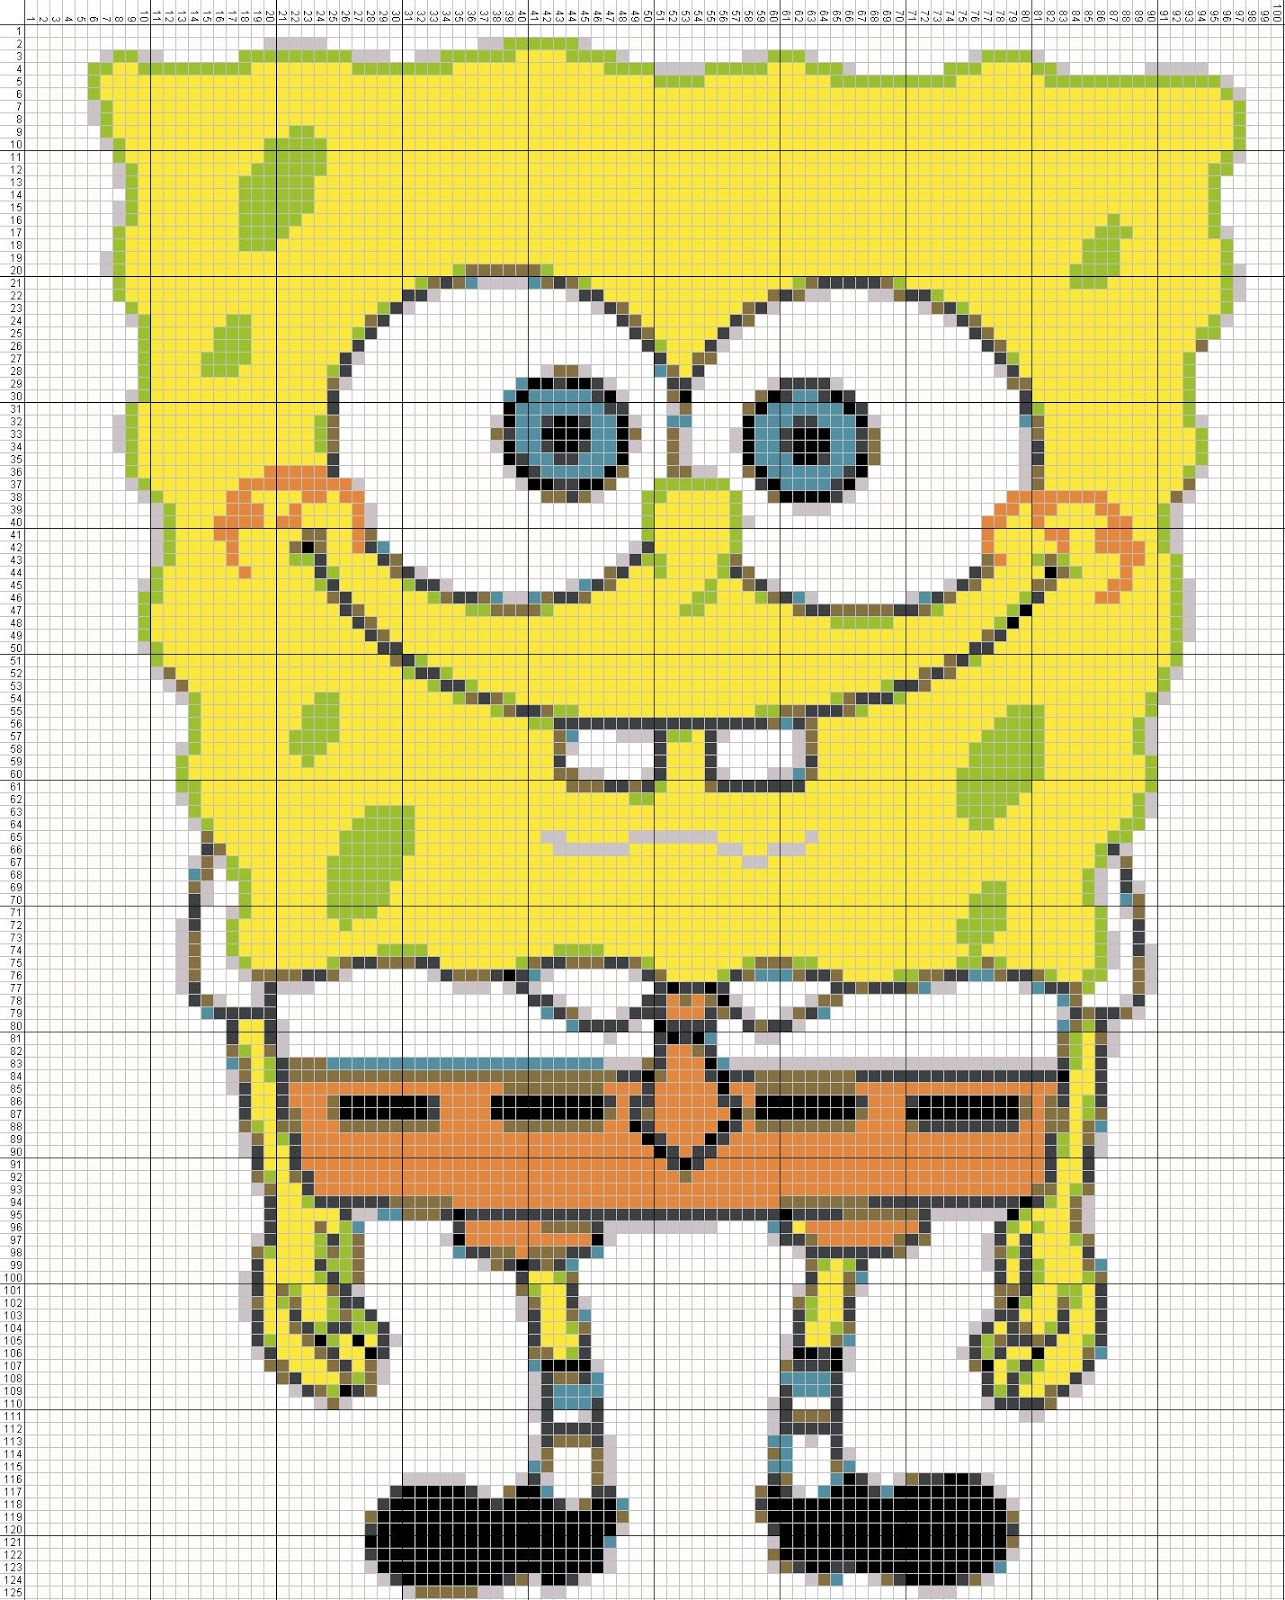 Gambar Pola Kristik Sederhana Spongebob